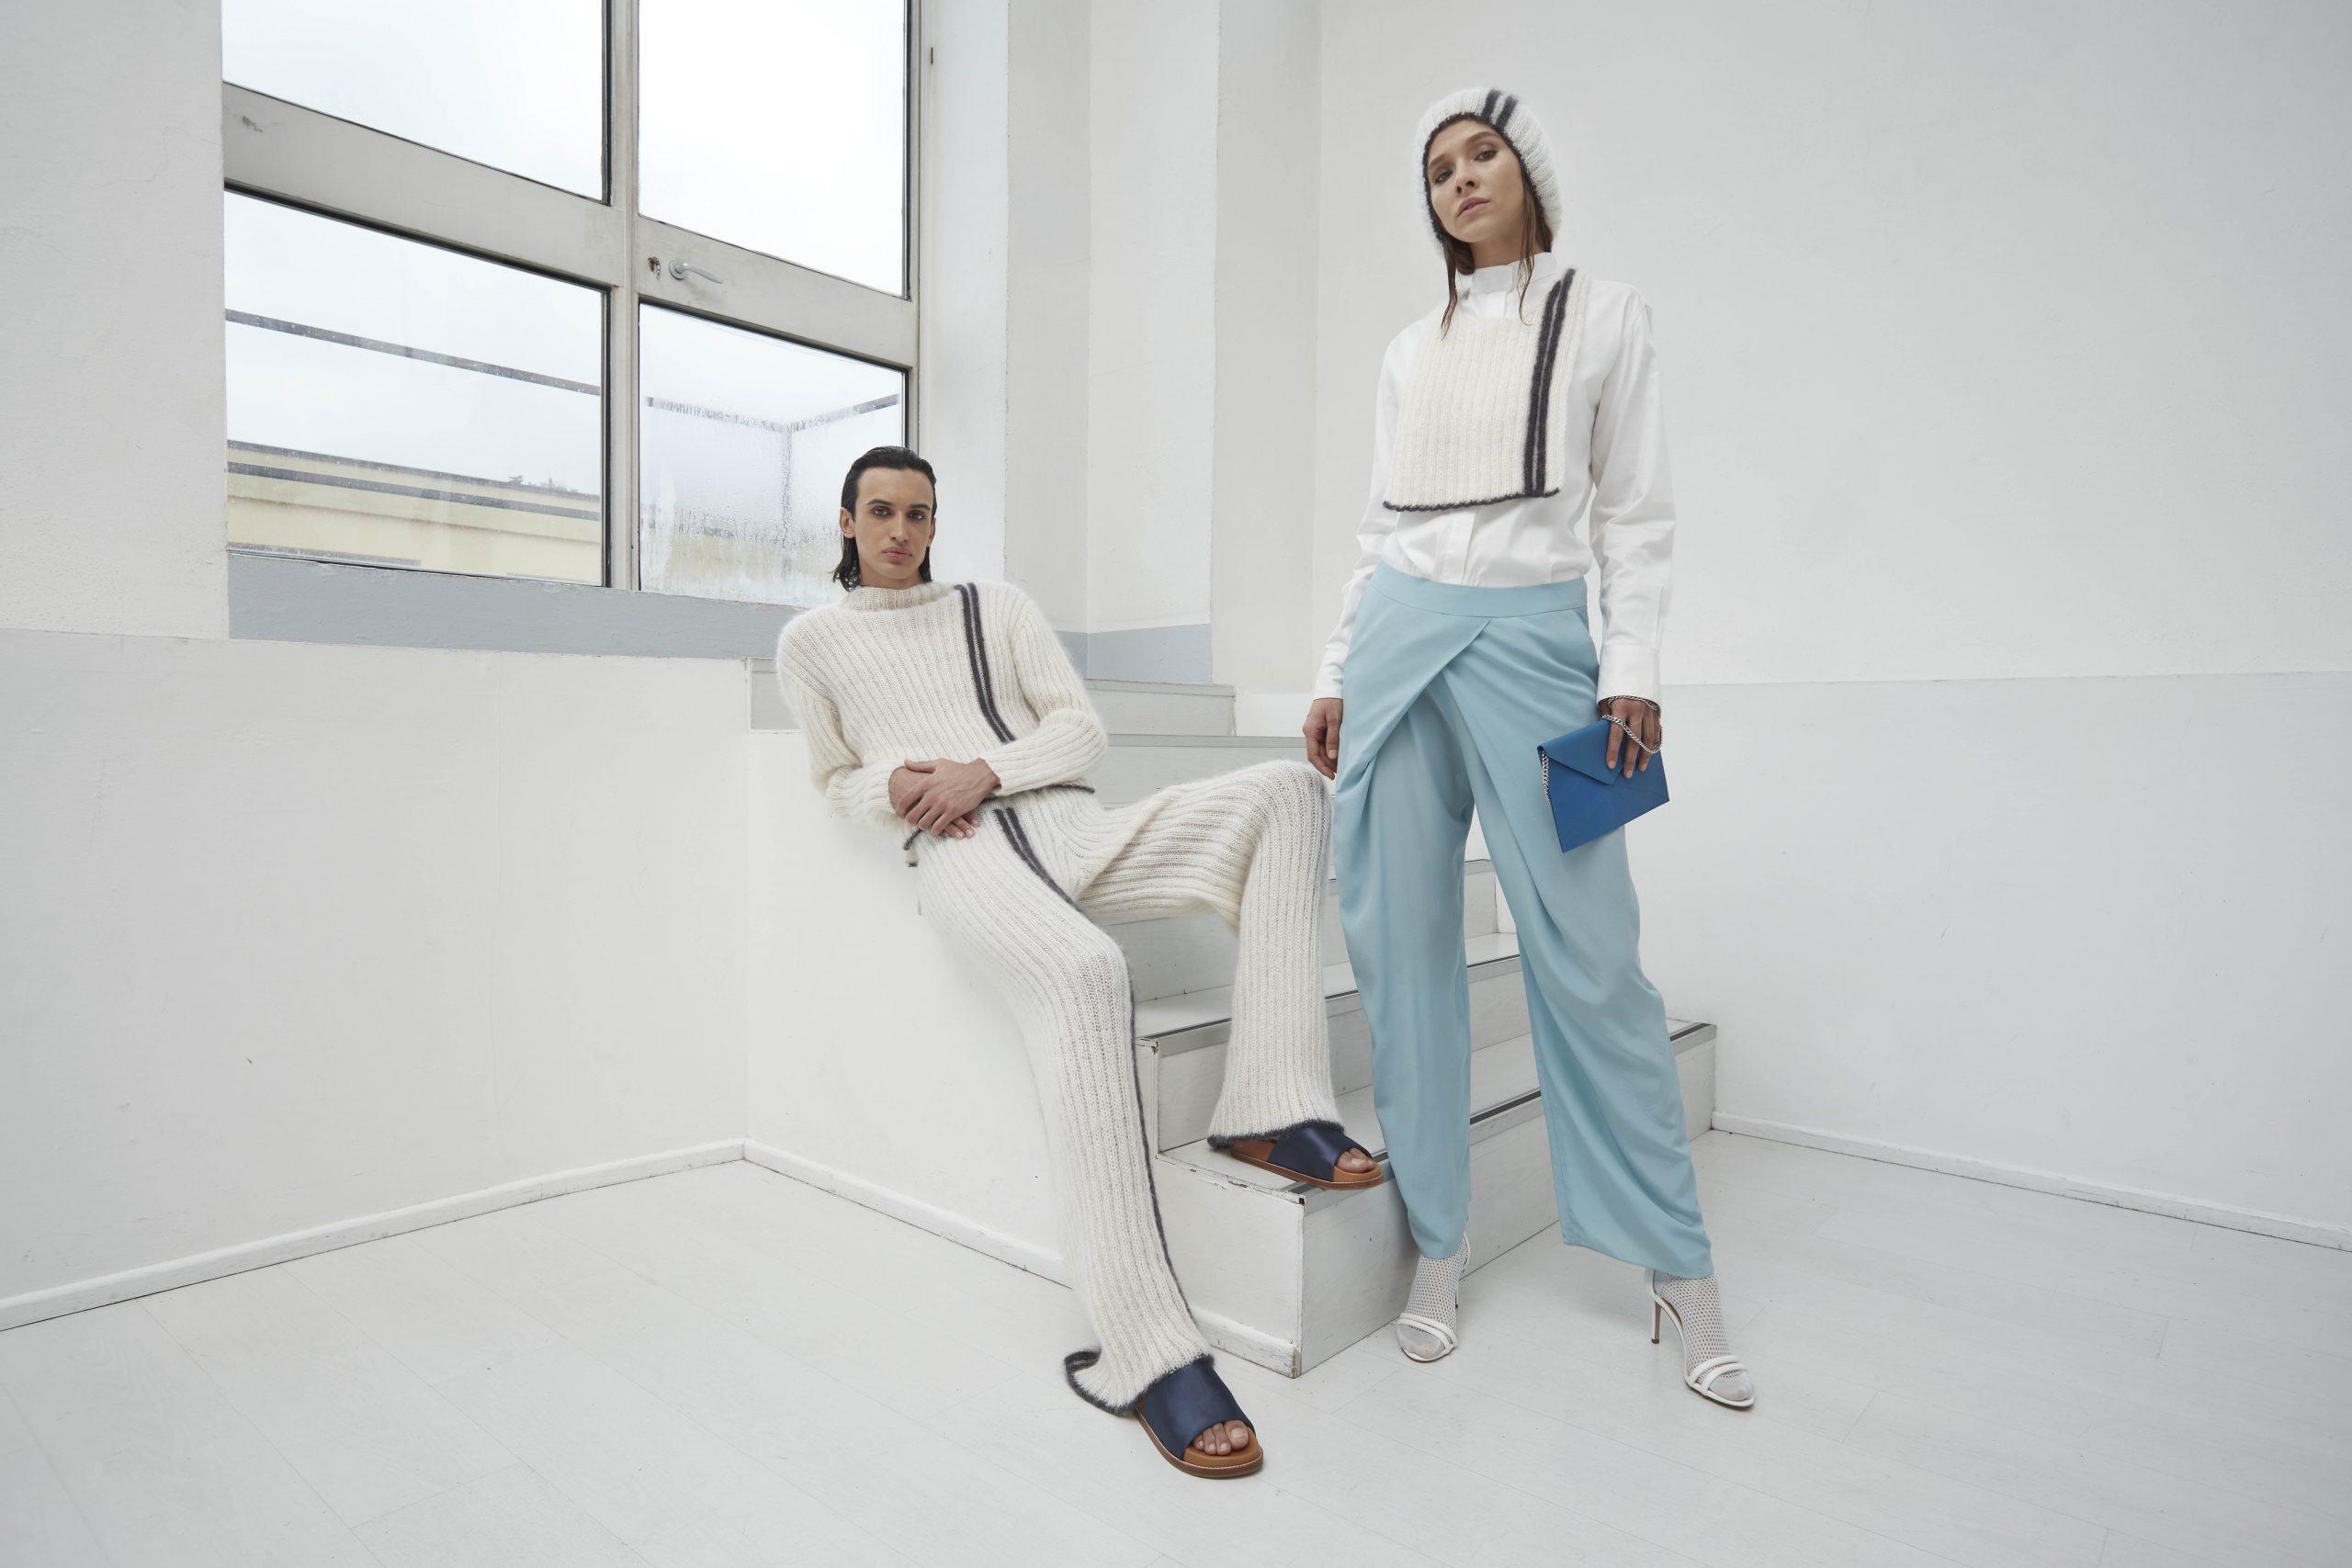 26_BAV_TAiLOR_SATTVA_AW21-22_Koco Knitwear_bib_lokya_escape_trousers_silk_b